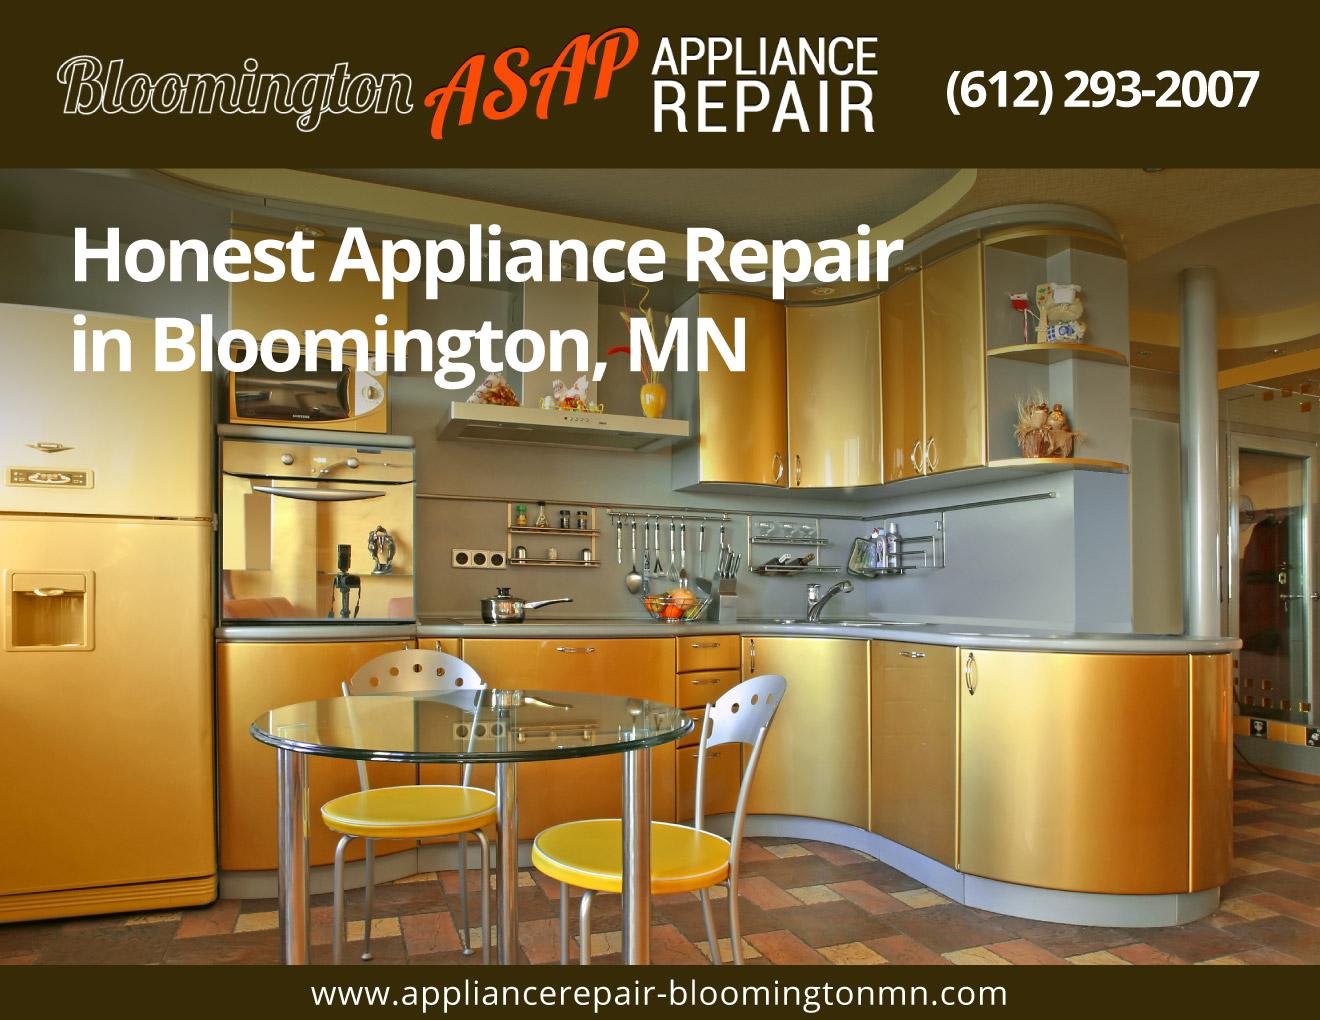 Bloomington Asap Appliance Repair 612 293 2007